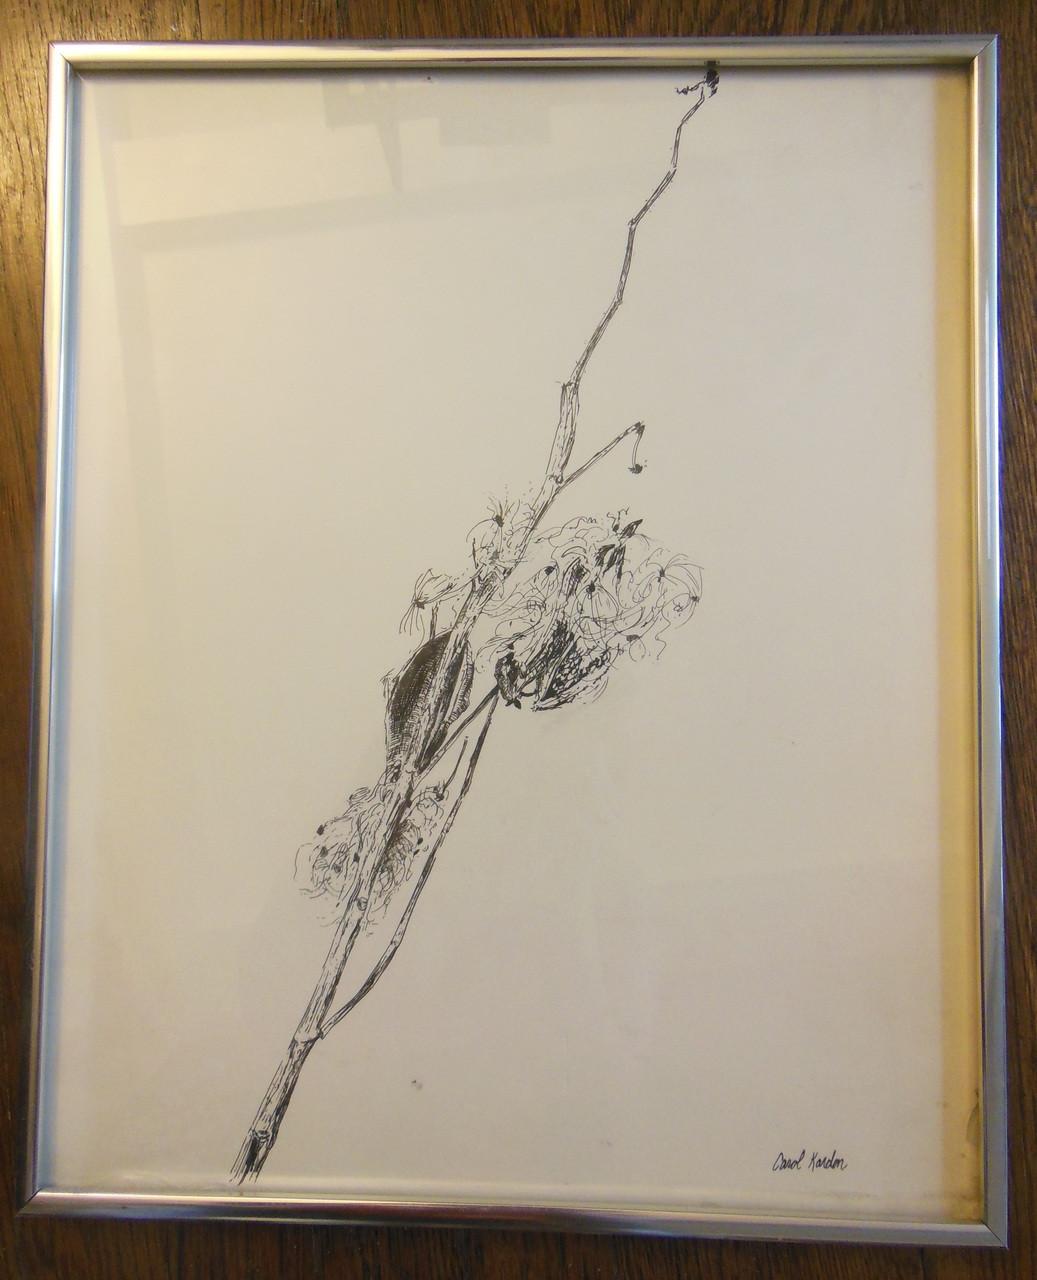 Carol Kardon. Detailed Flower in Black and White. Framed drawing